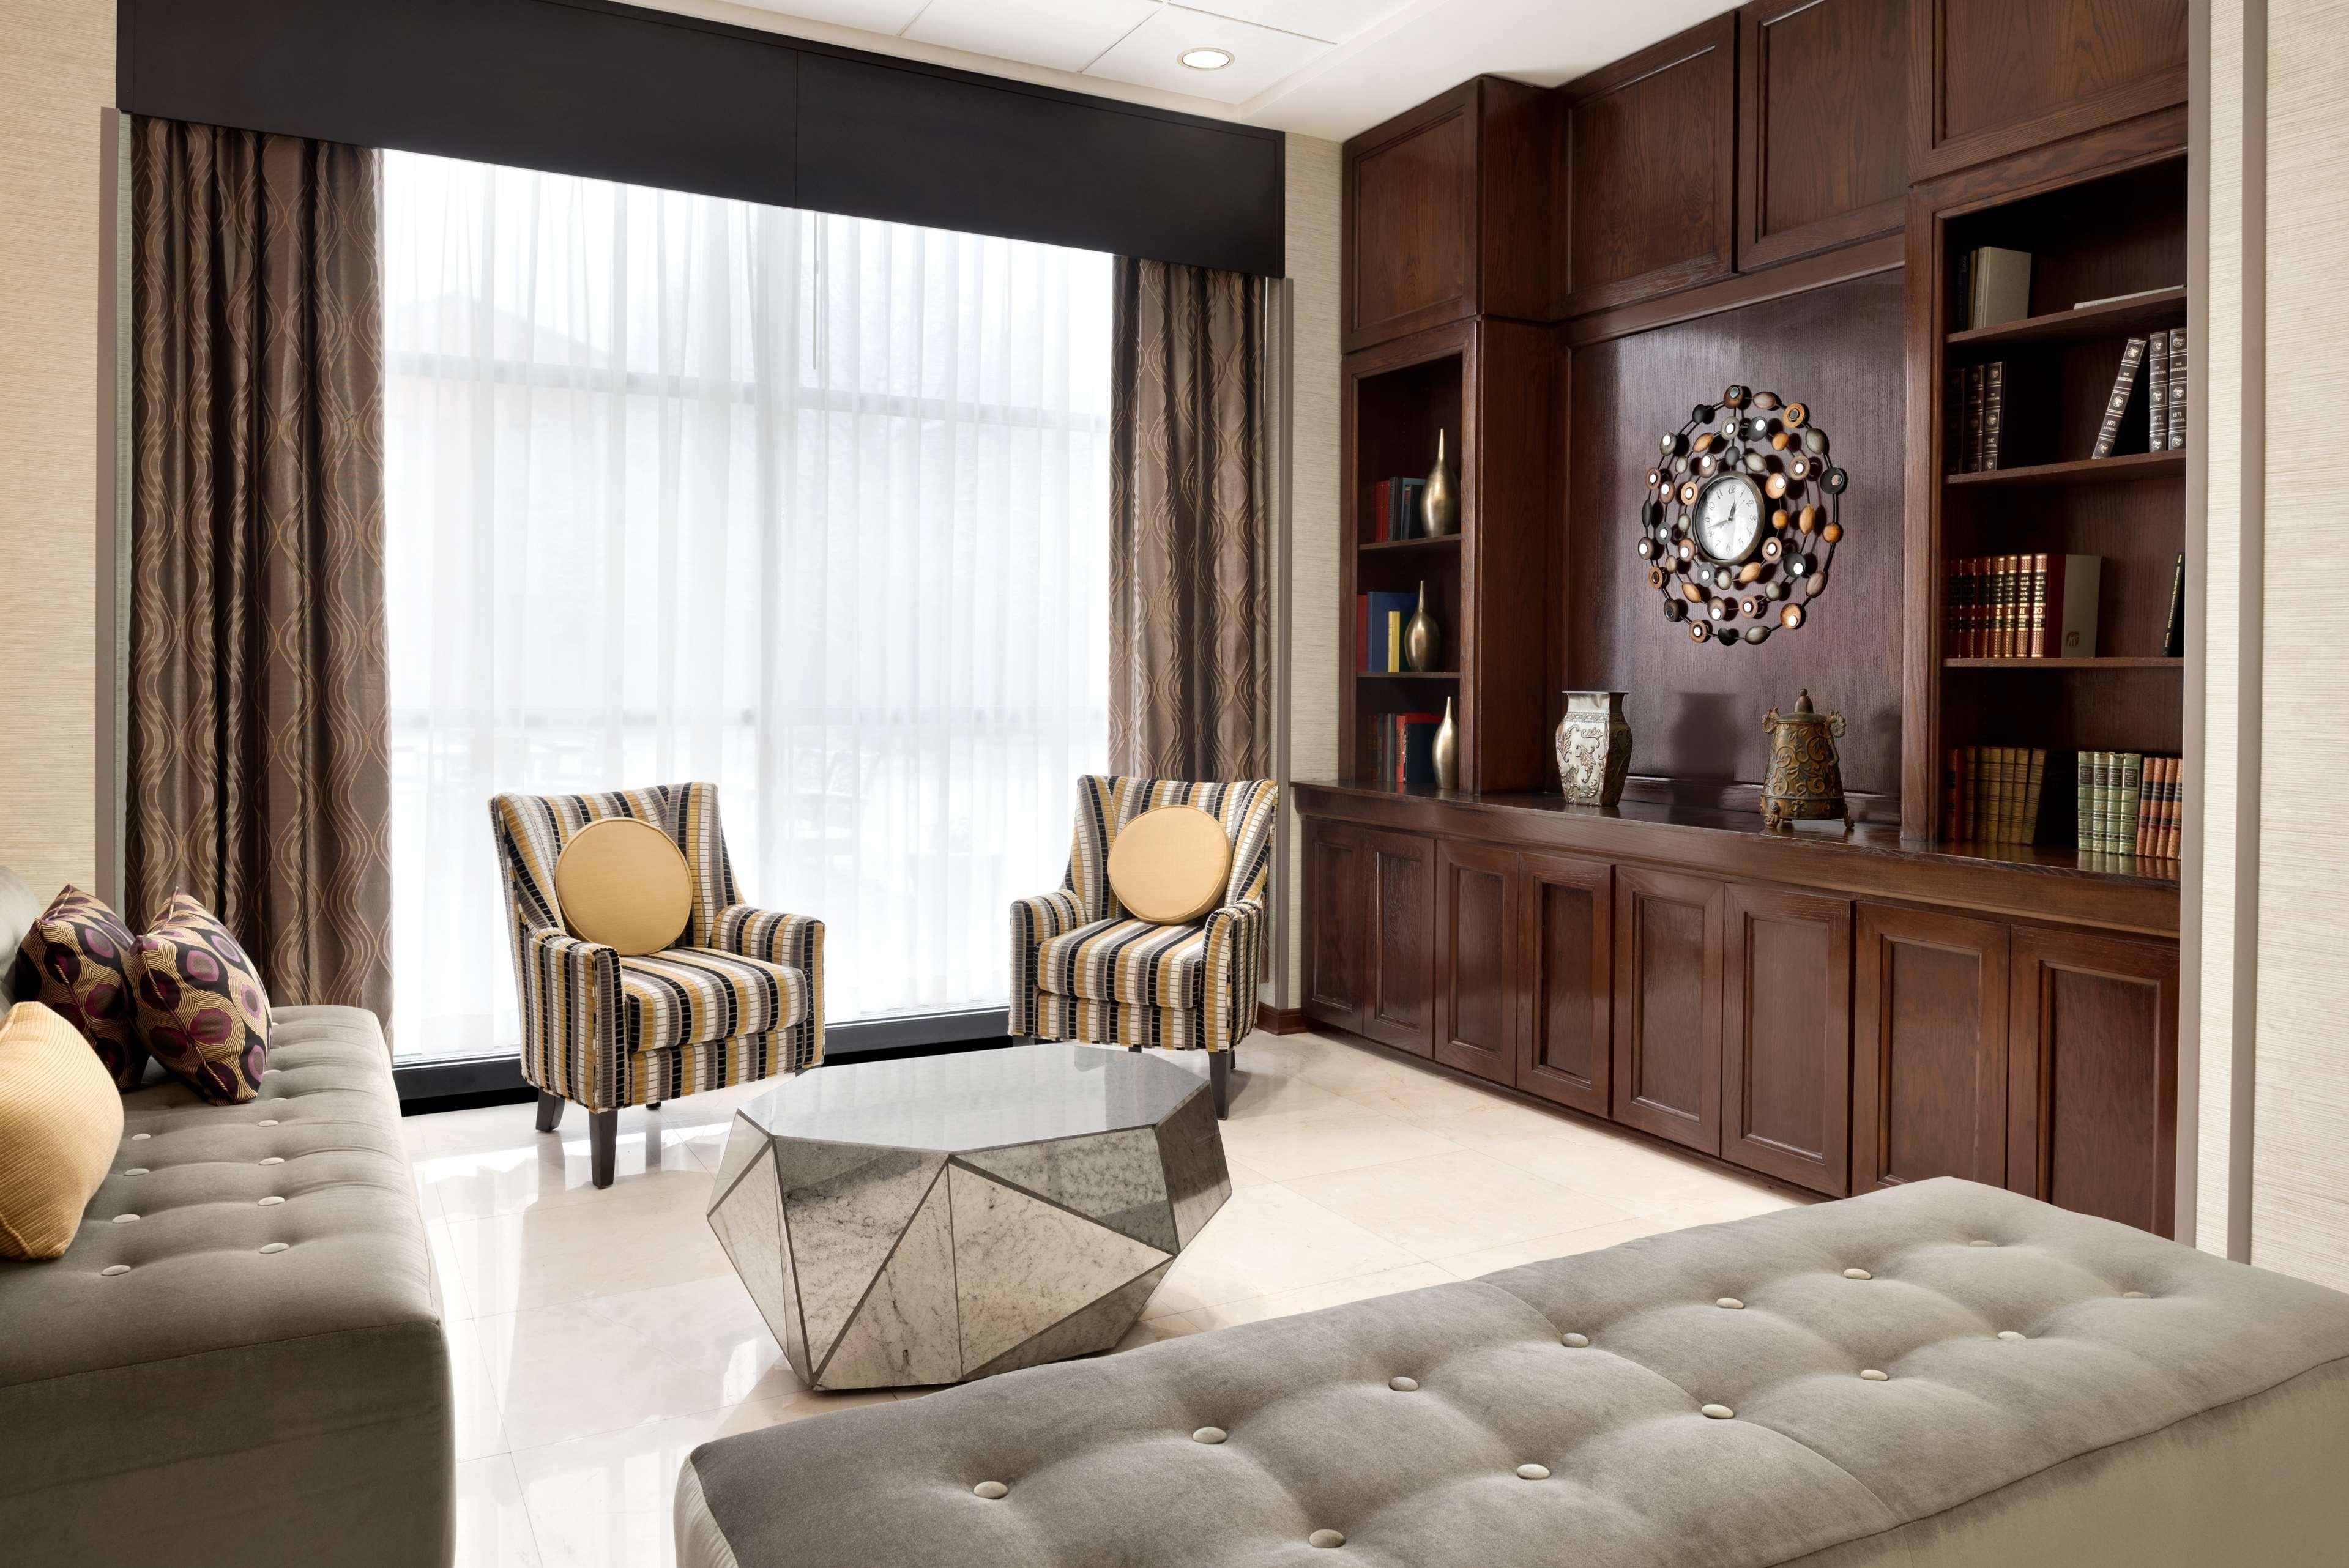 DoubleTree by Hilton Hotel Milwaukee - Brookfield image 5